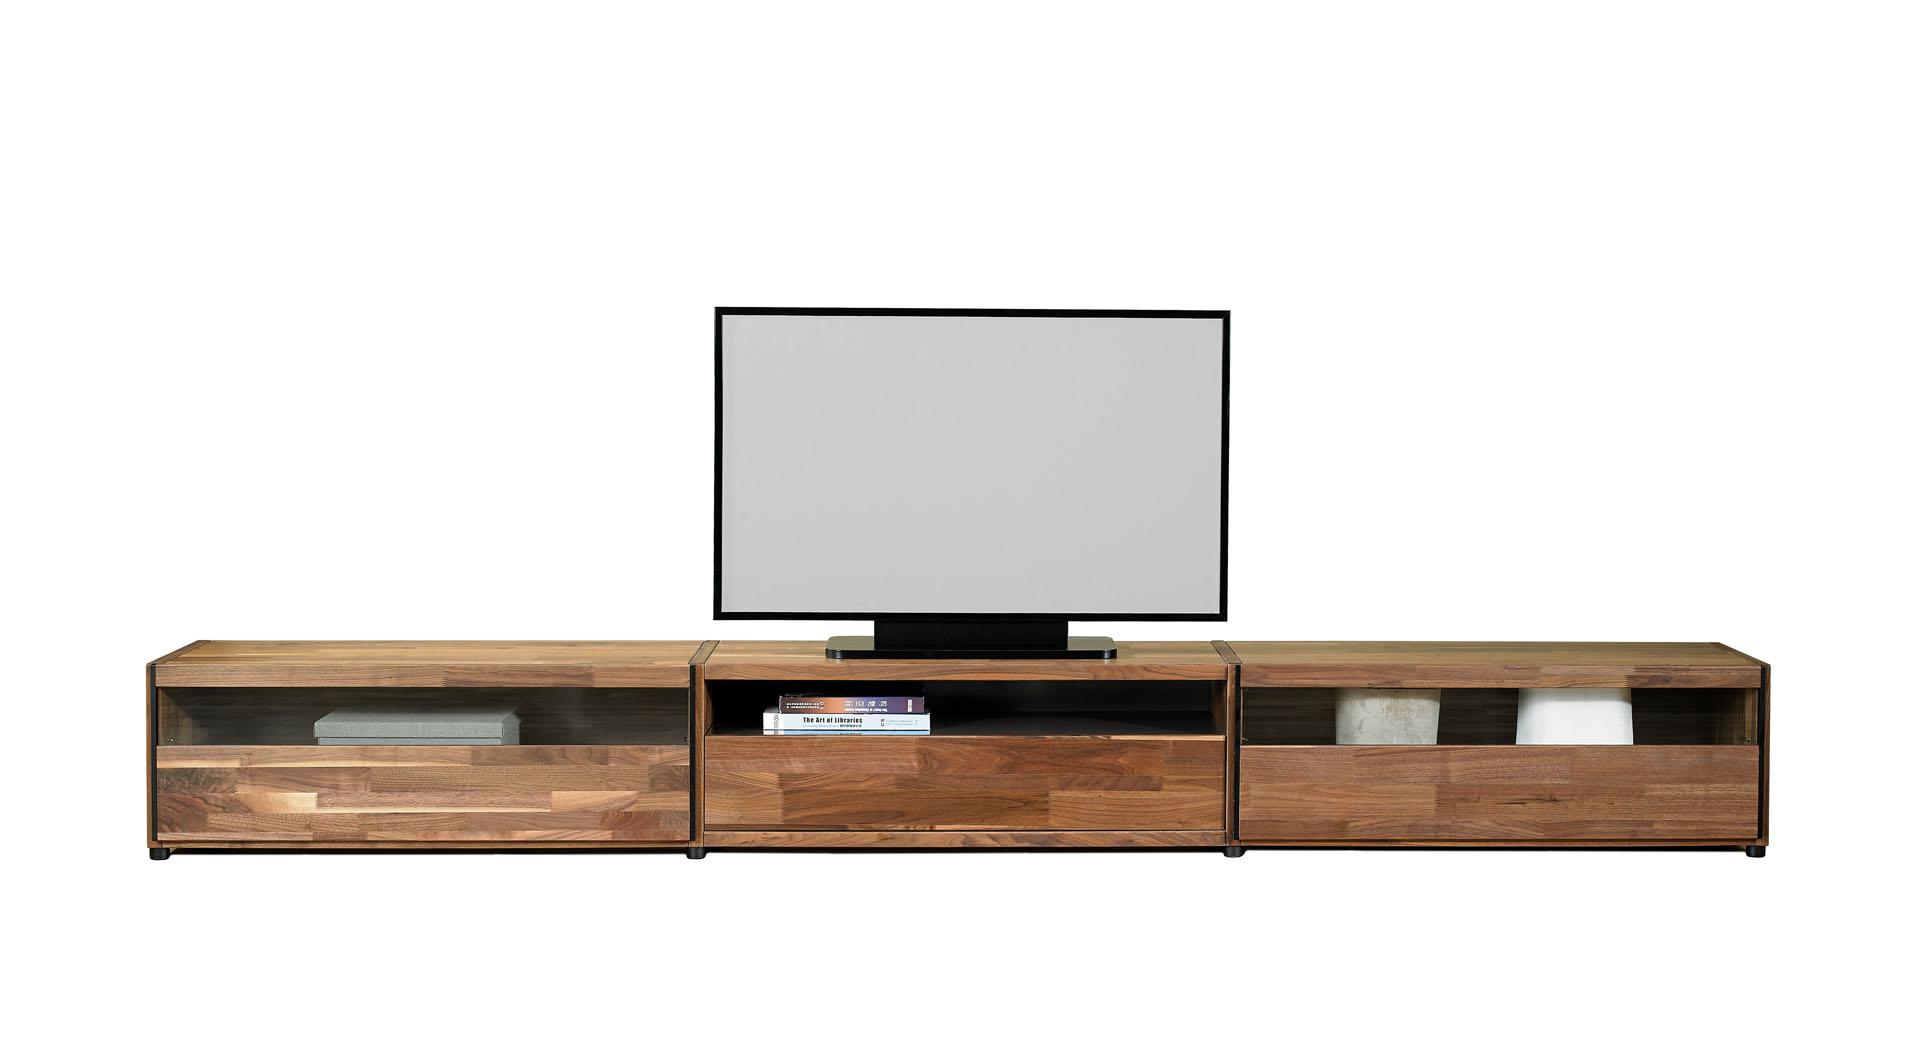 Wall Tv Stand Living Room Furniture Modern Wooden Designs Buy Wall Tv Stands Tv Stand Living Room Furniture Wooden Wall Tv Stand Modern Wooden Product On Alibaba Com